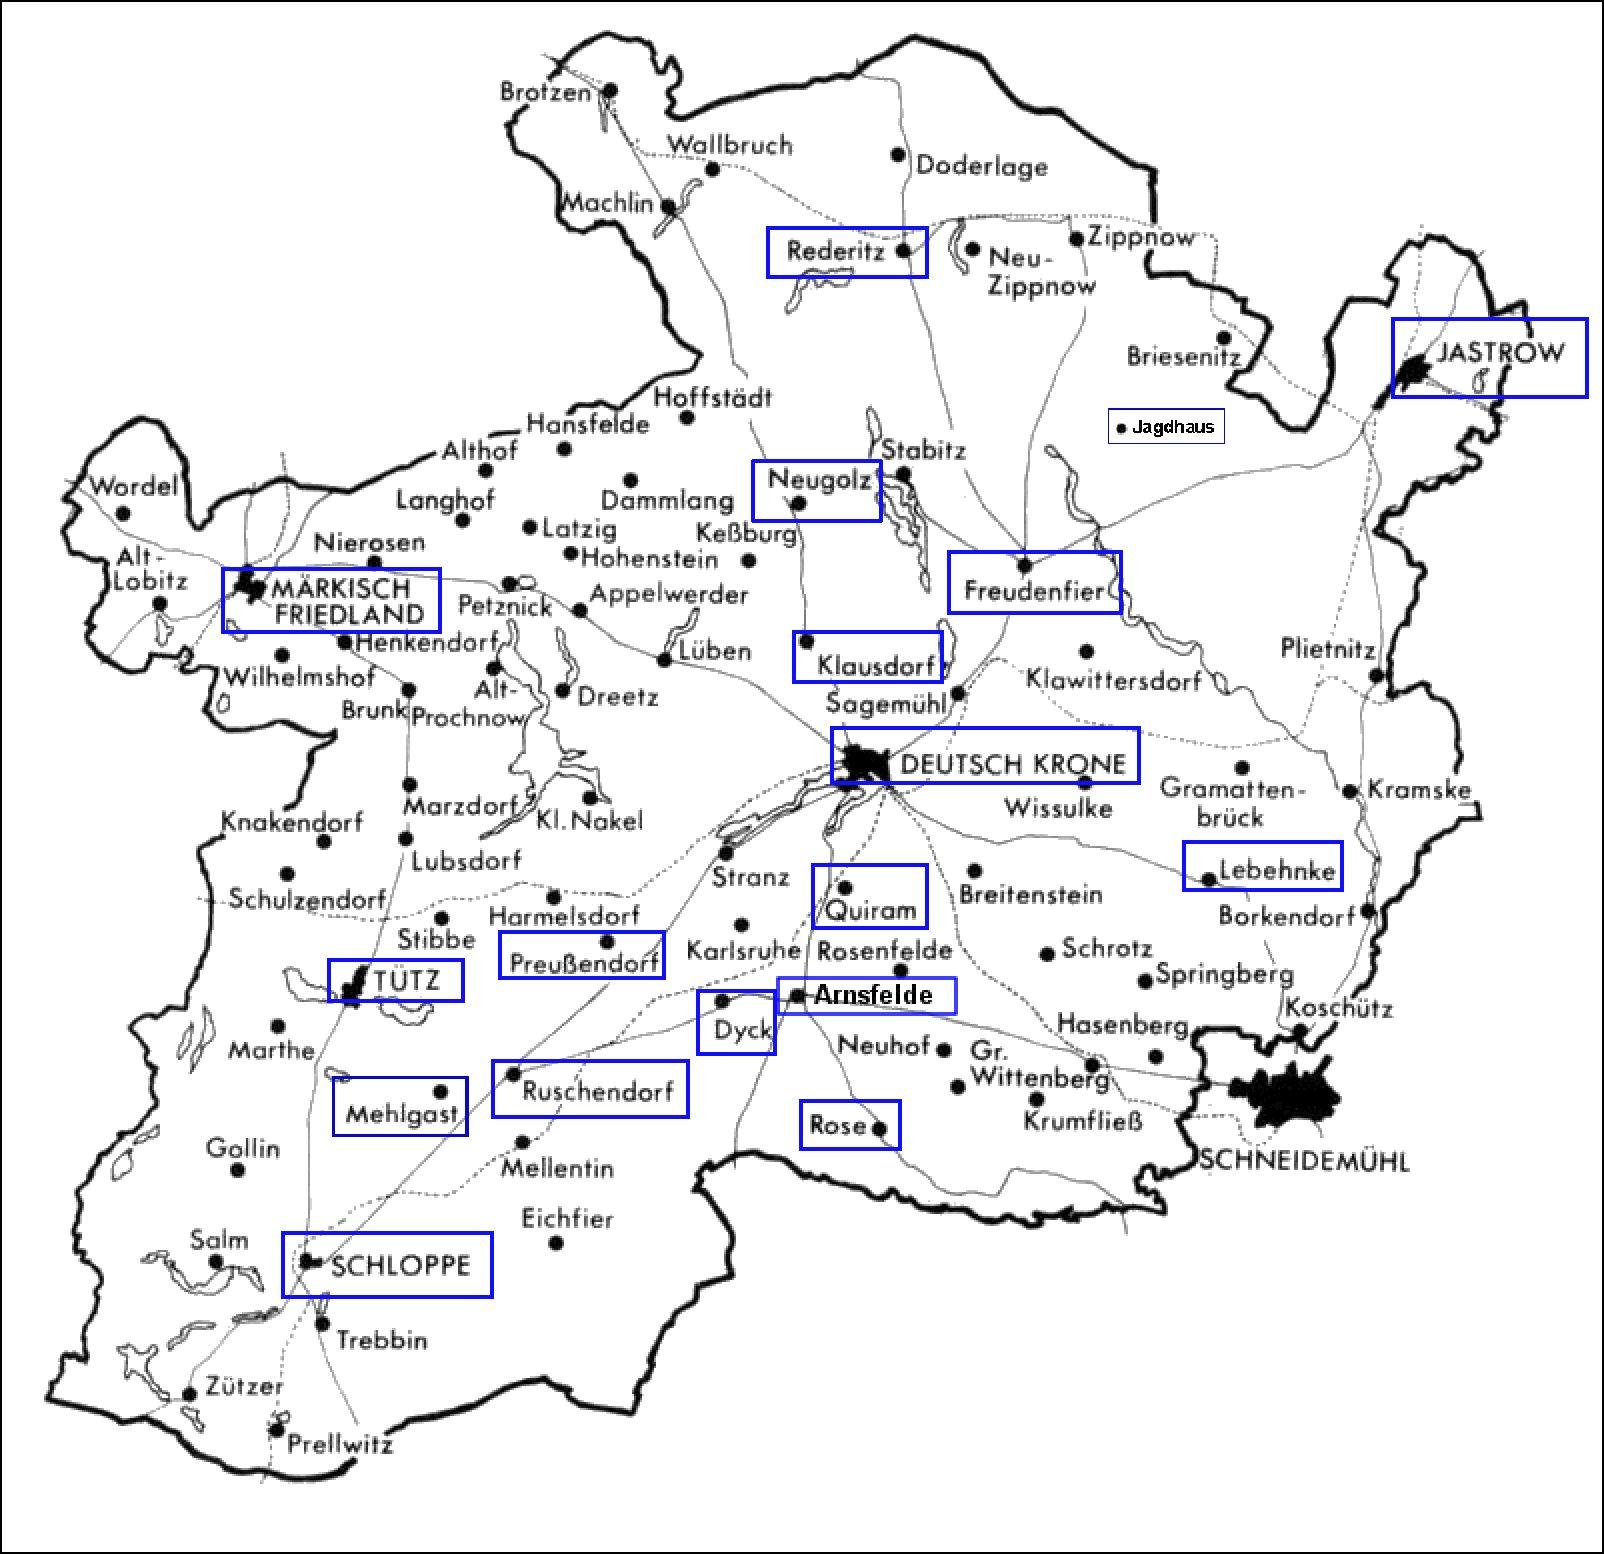 Schloppe In Kreis Deutsch Krone In West Prussia Schloppe Has Also Been Part Of Posen And Also Pommern Dahlmans Were Married There History Ancestry Ancestral